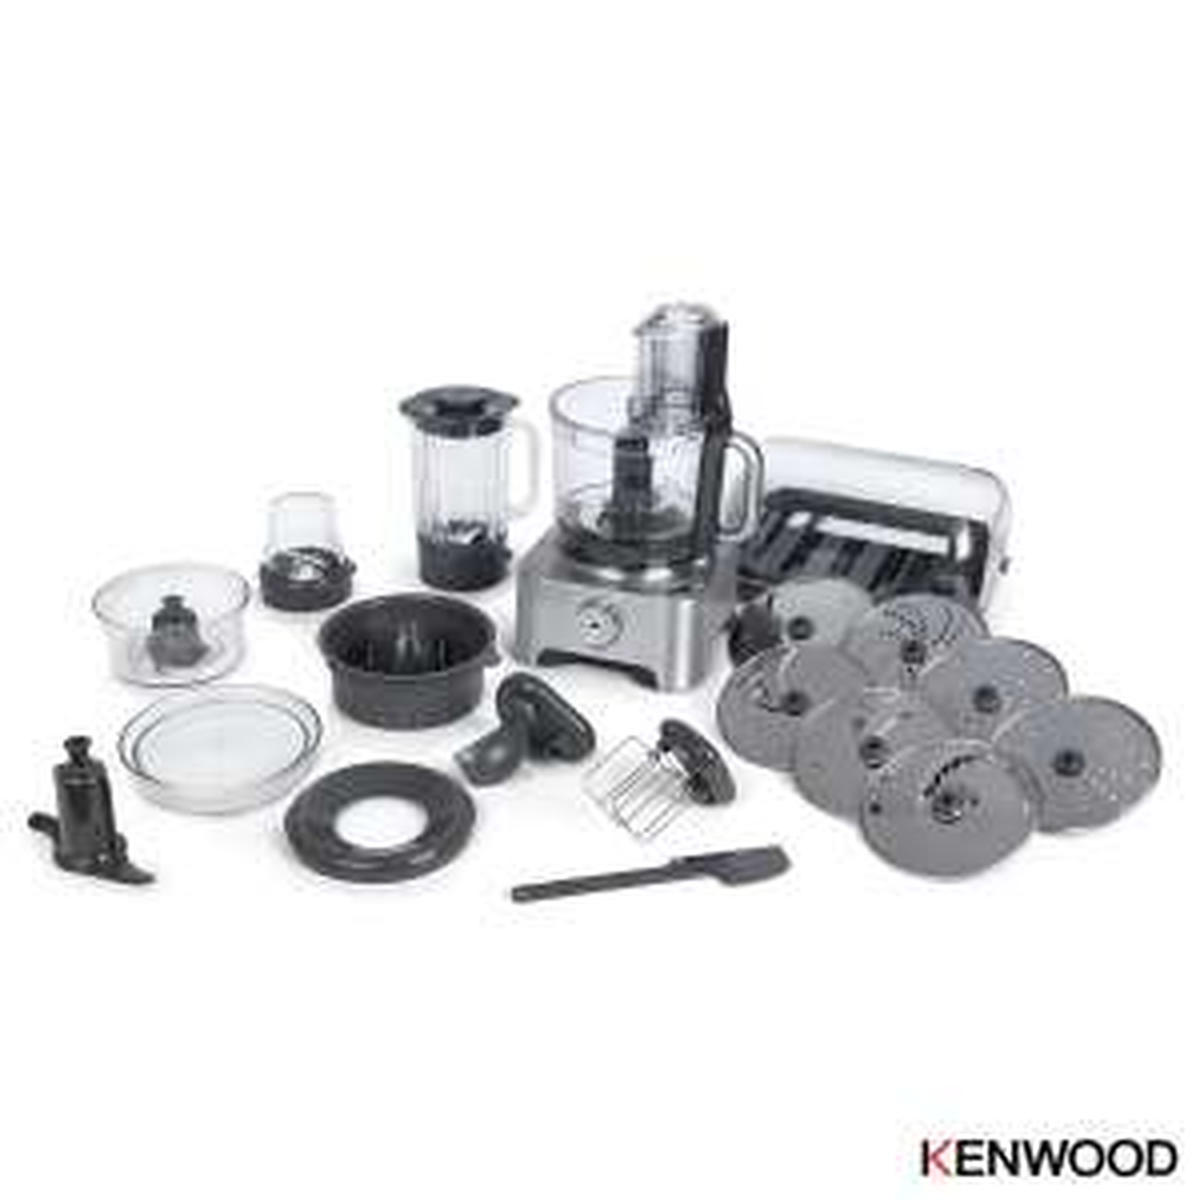 Kenwood Multipro Excel Food Processor FPM910 £279.99 (Membership Required) @ Costco